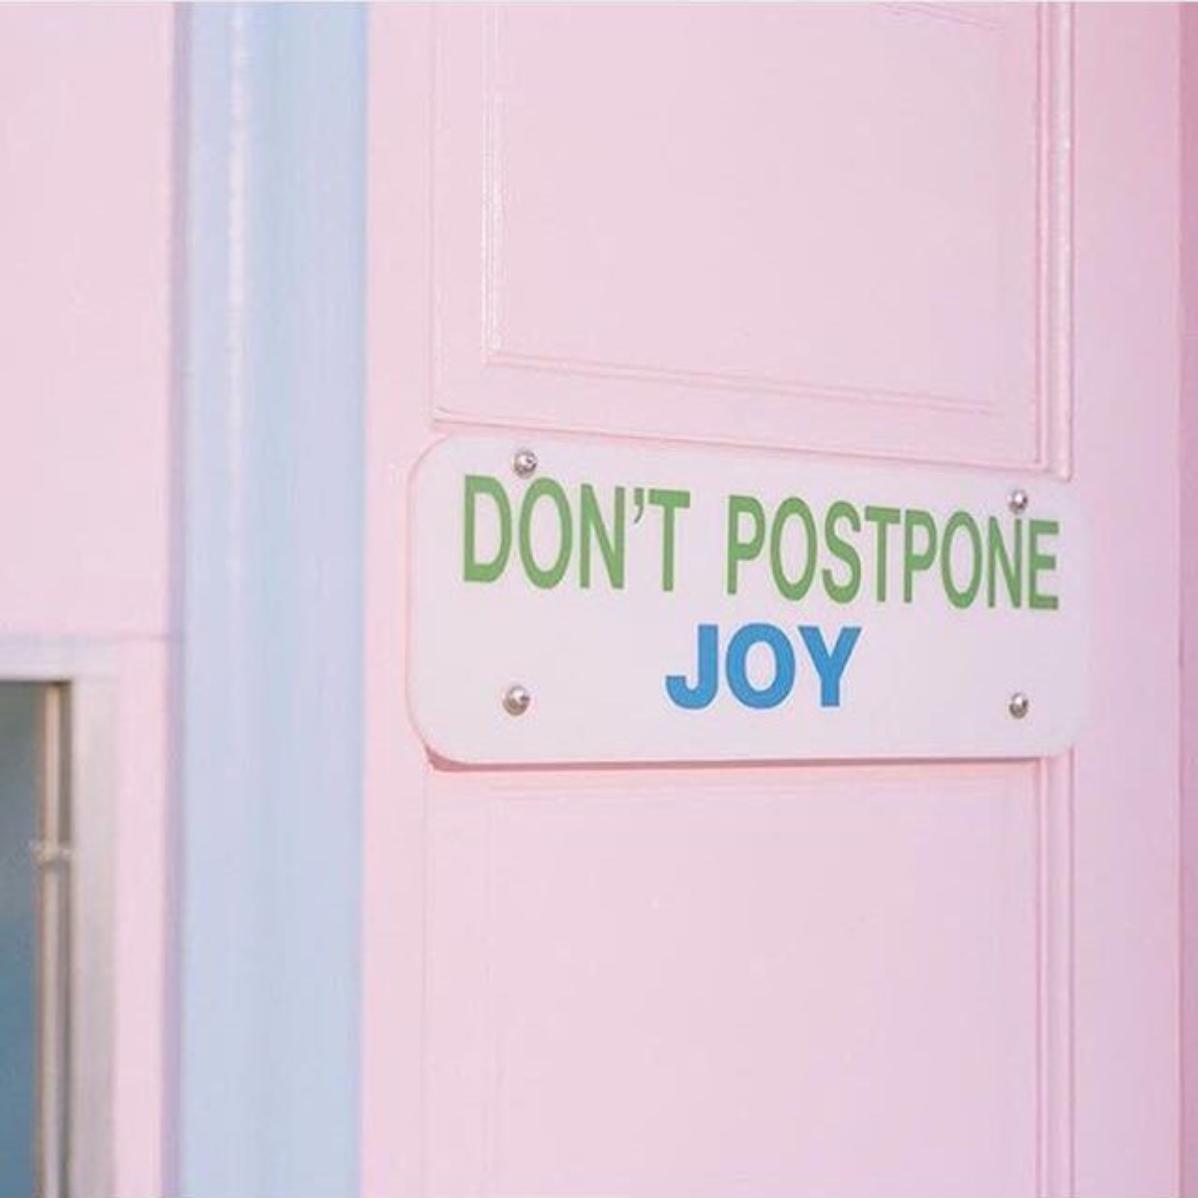 dont postpone joy.png